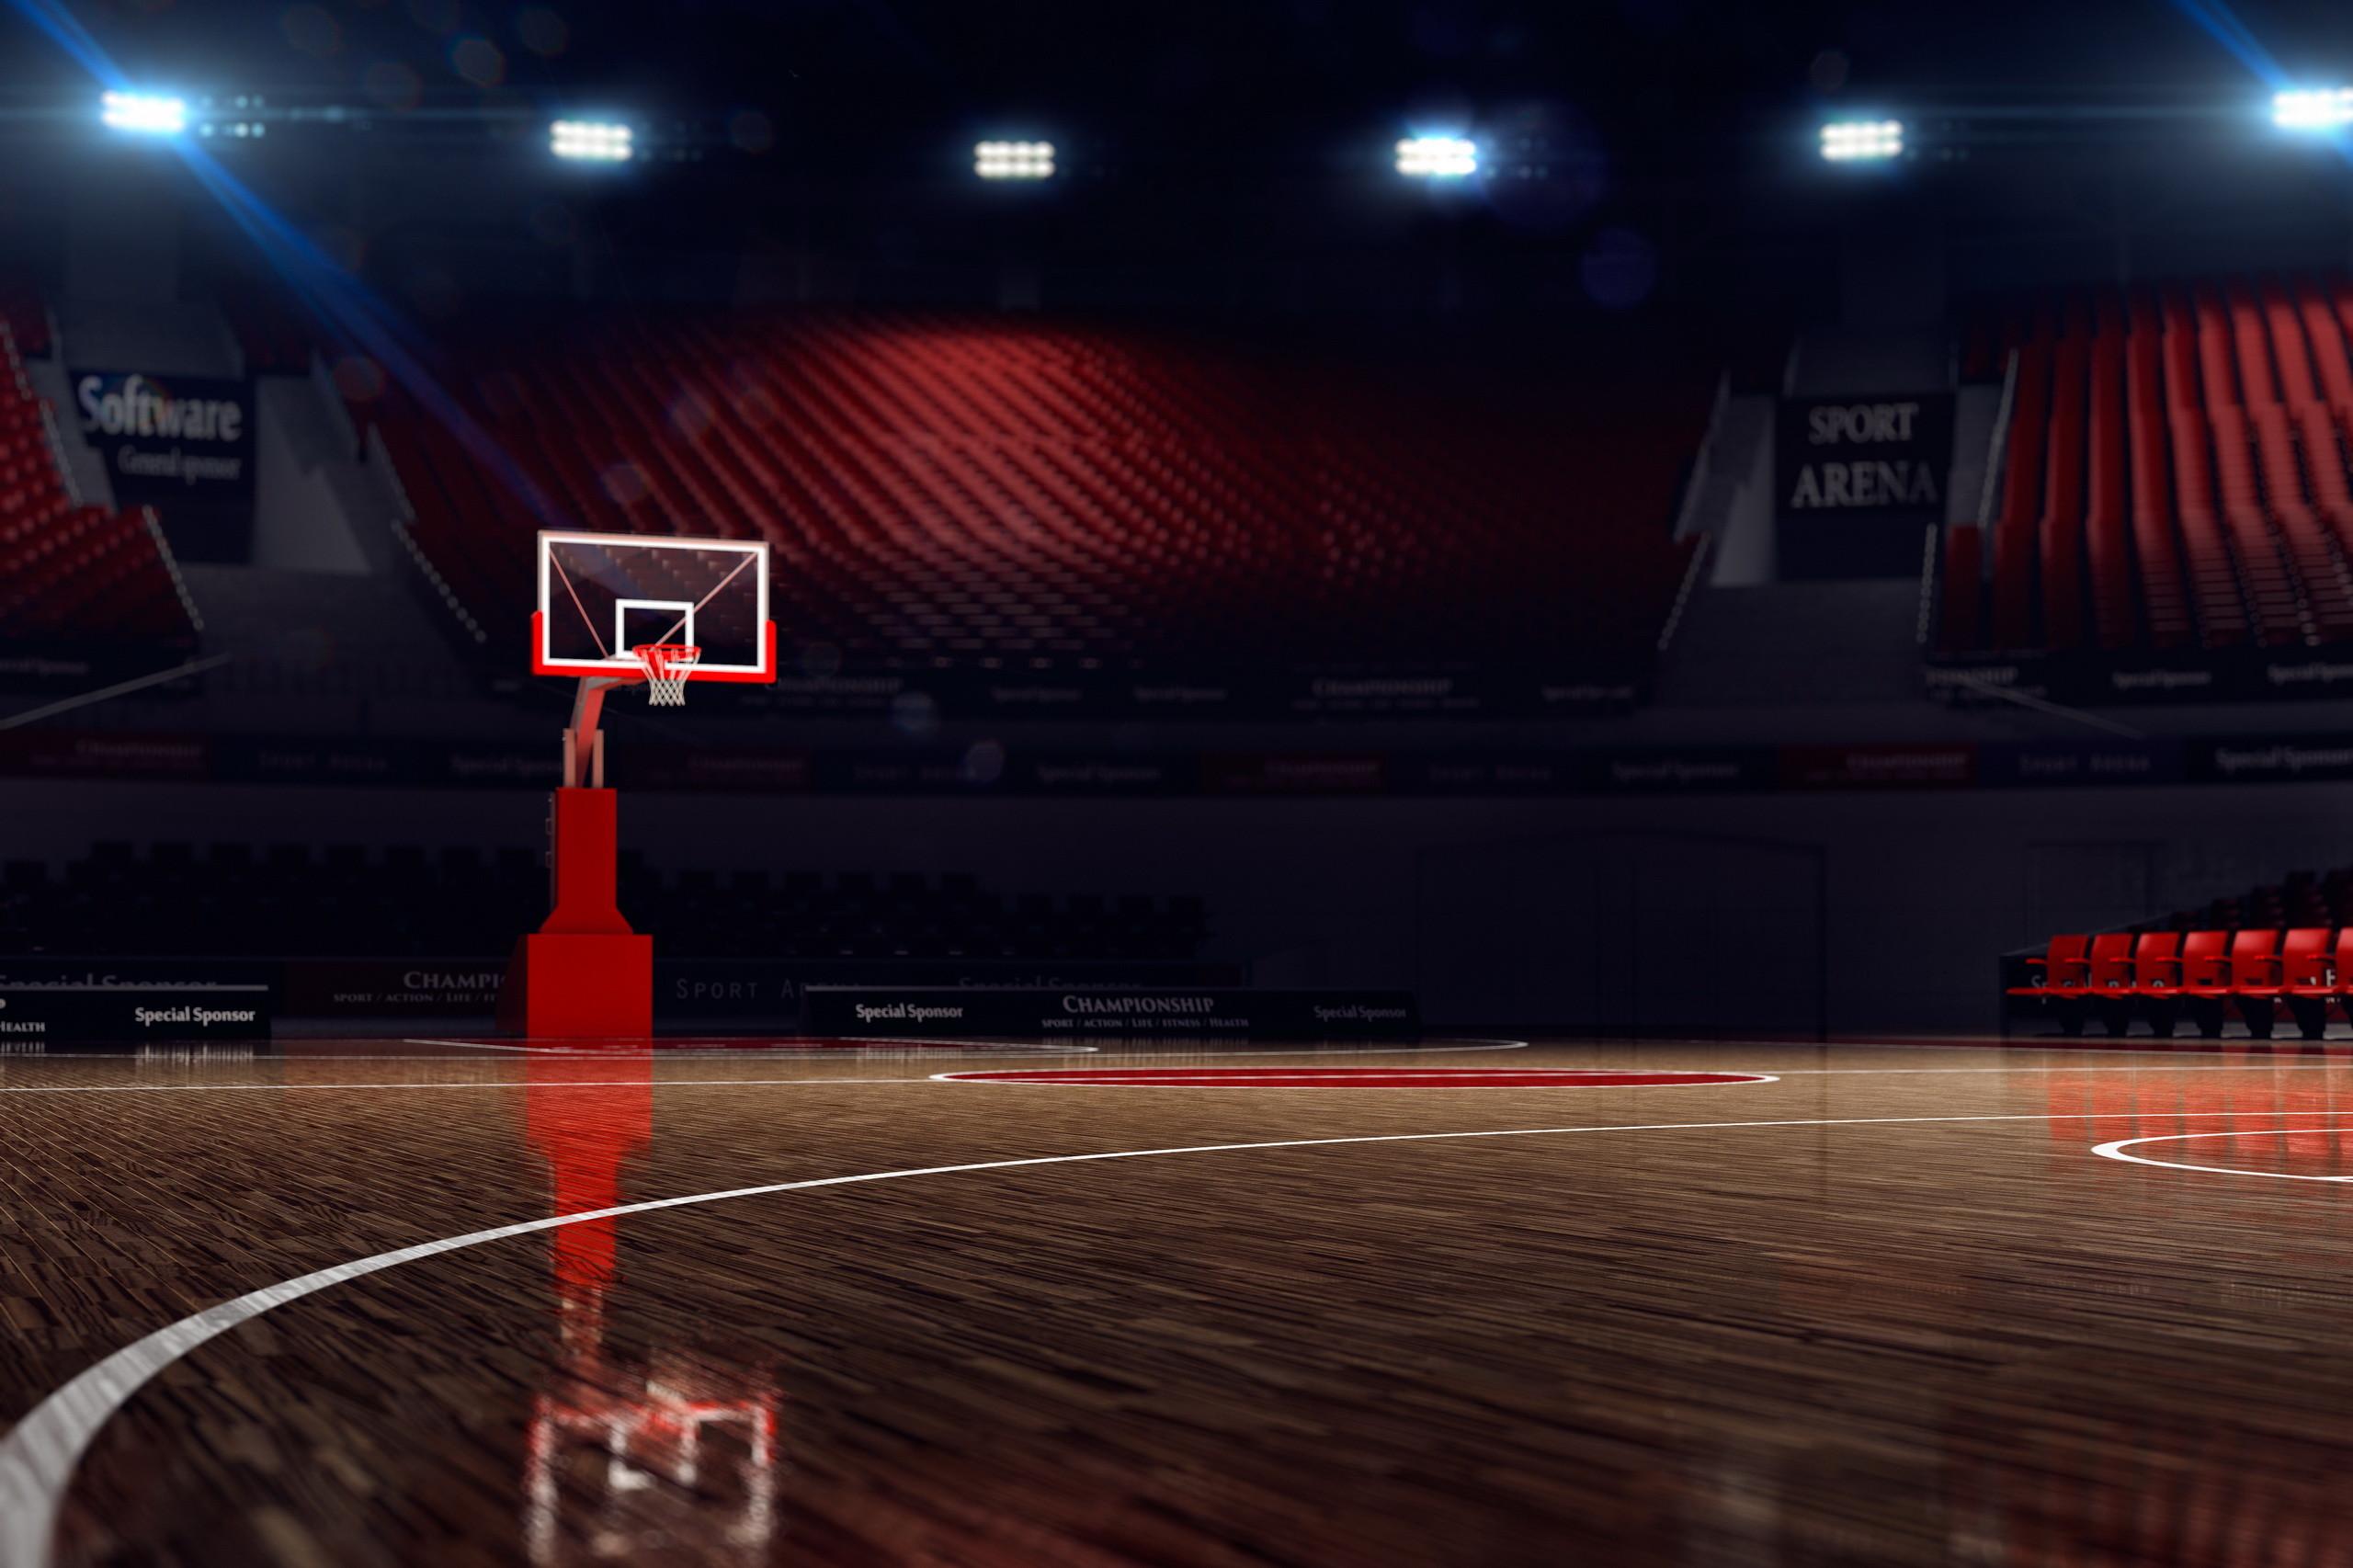 Basketball Court Wallpaper Background Free Download GameFree